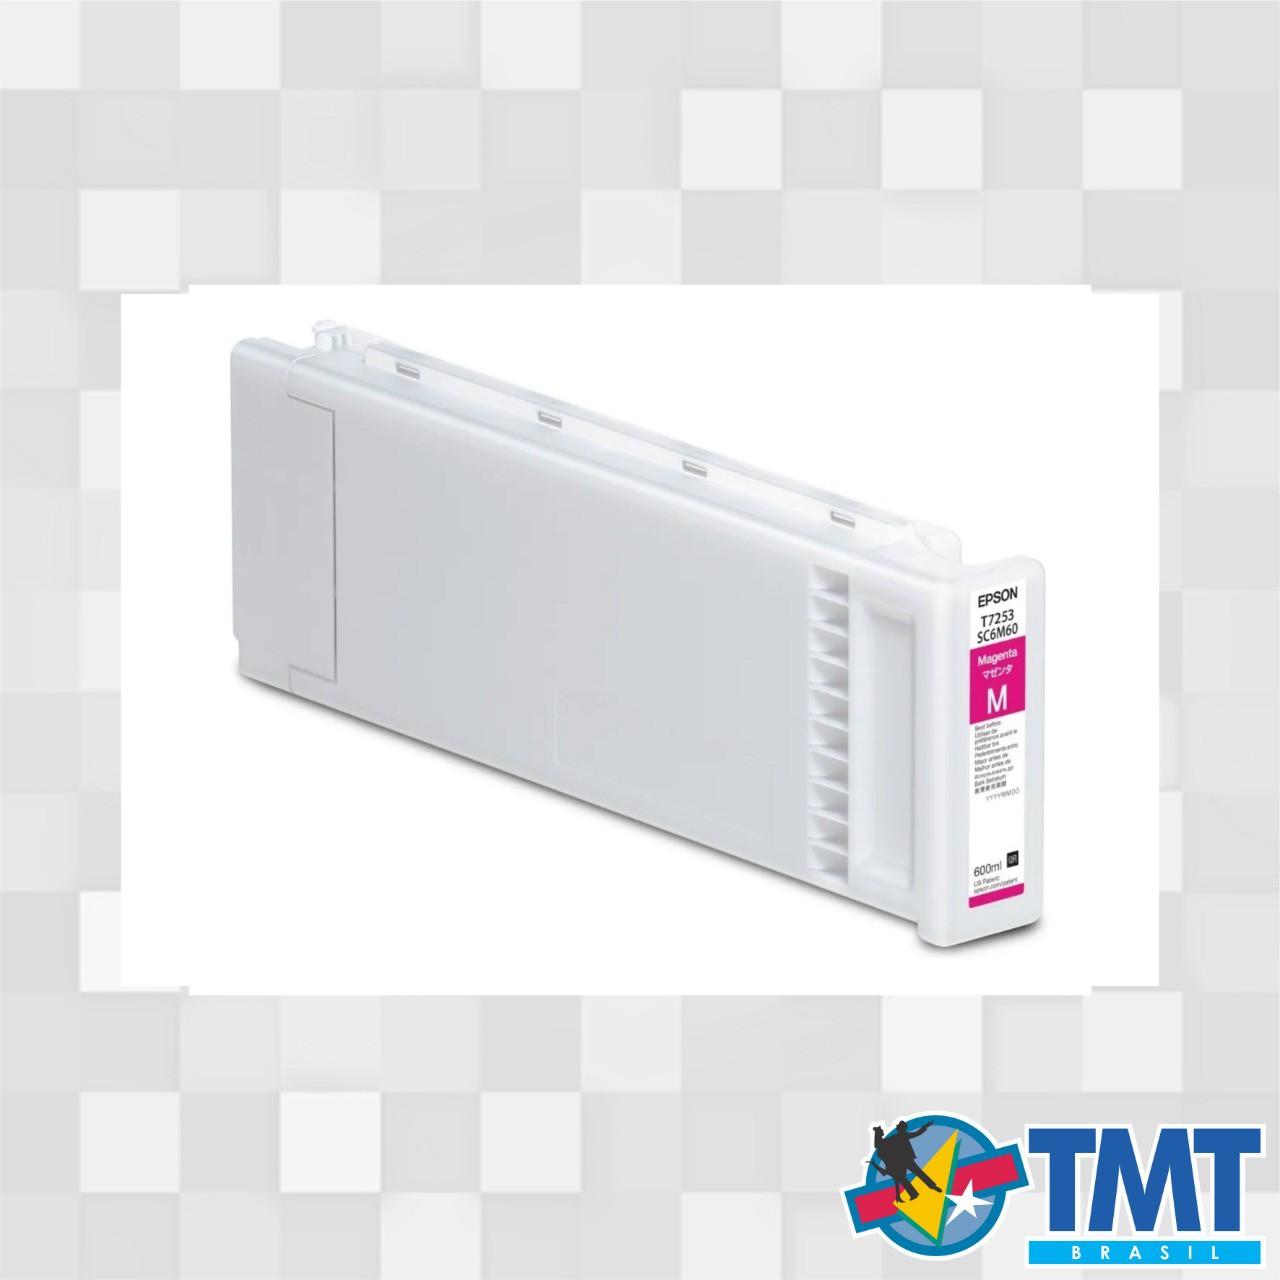 Cartucho Impressora Epson Magenta T725300 - F2000/F2100